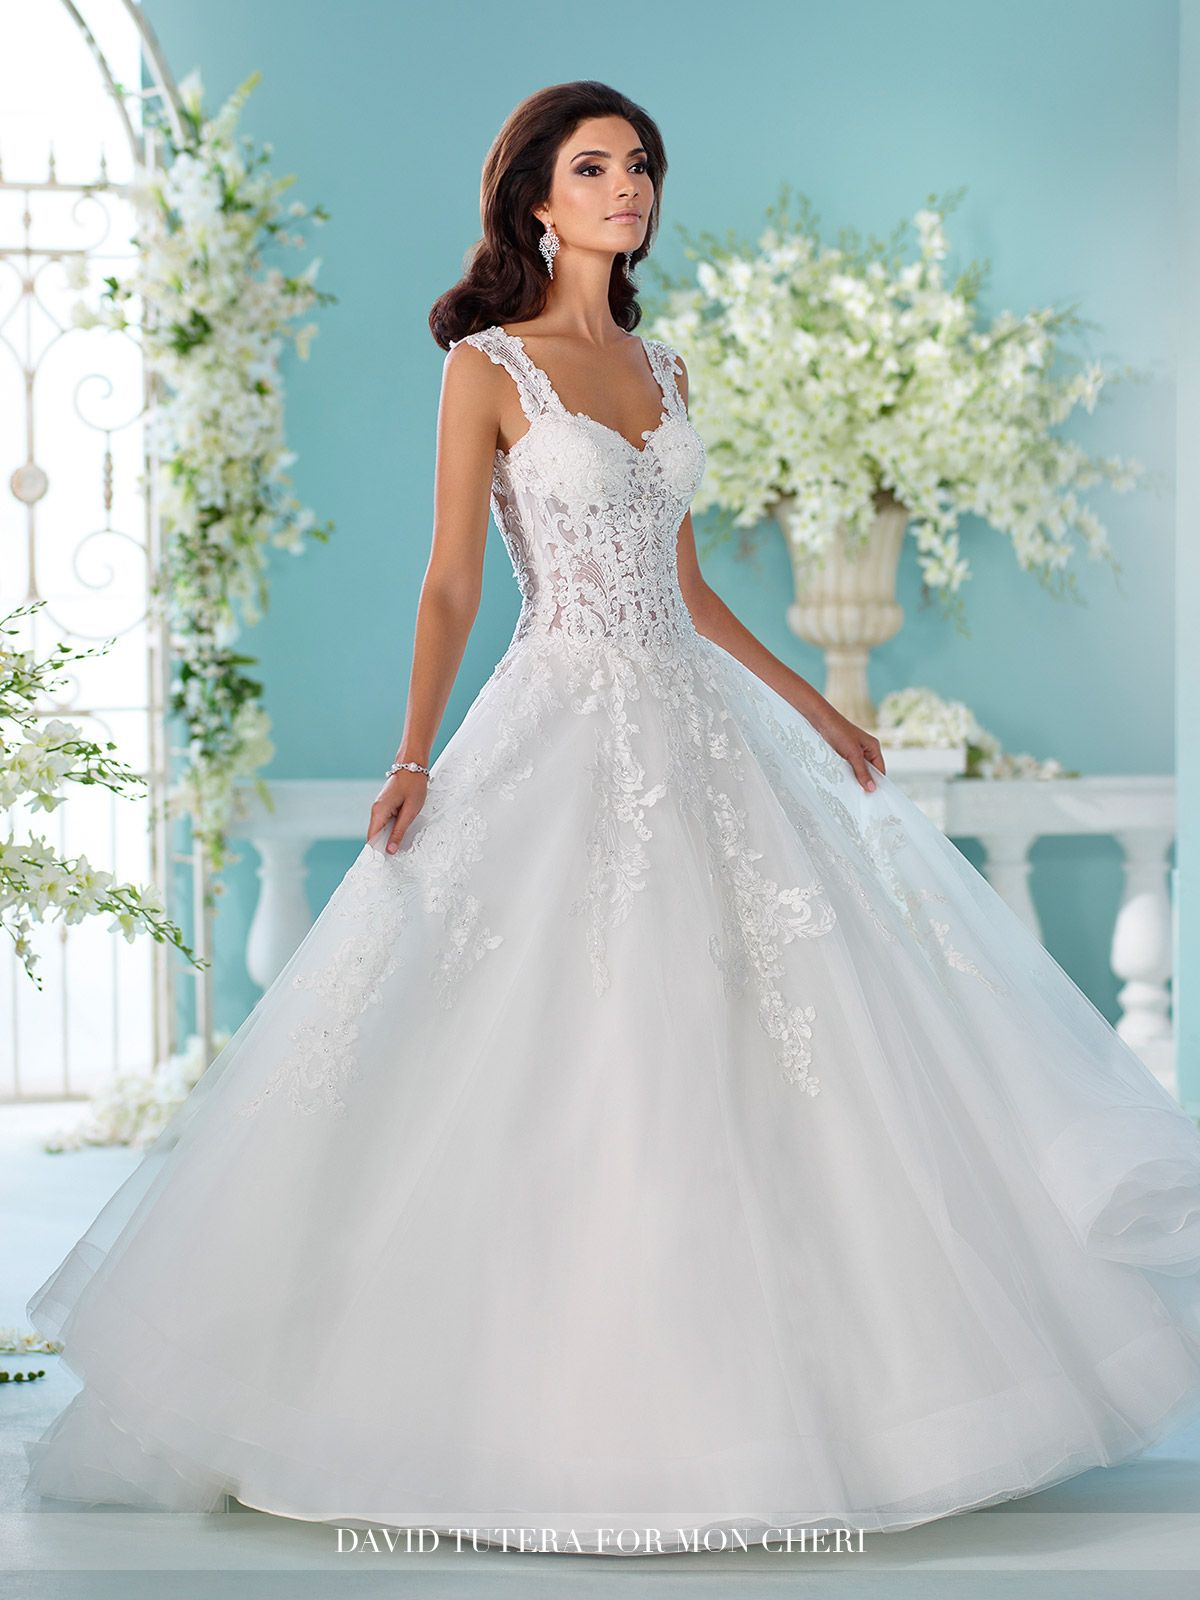 Unique Wedding Dresses Fall 2018 - Martin Thornburg | Pinterest ...